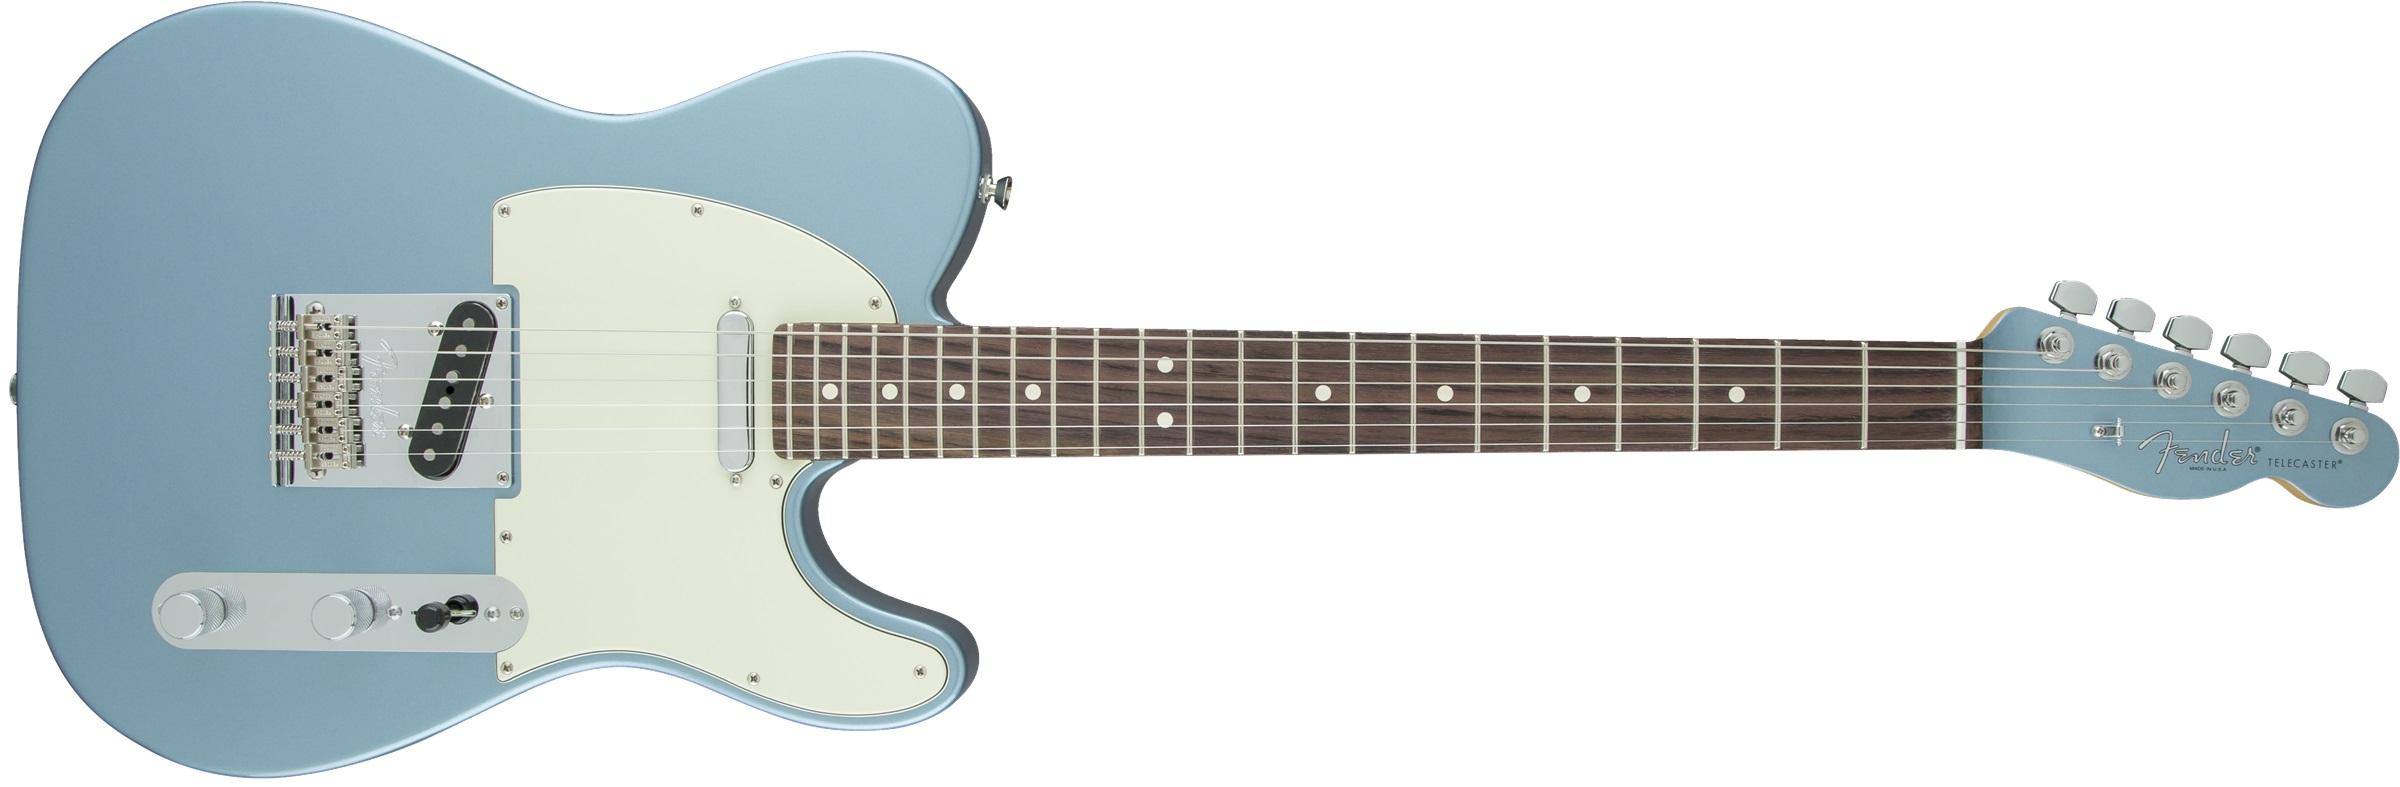 Fender 2016 Limited Edition American Standard Telecaster MH RW IBM